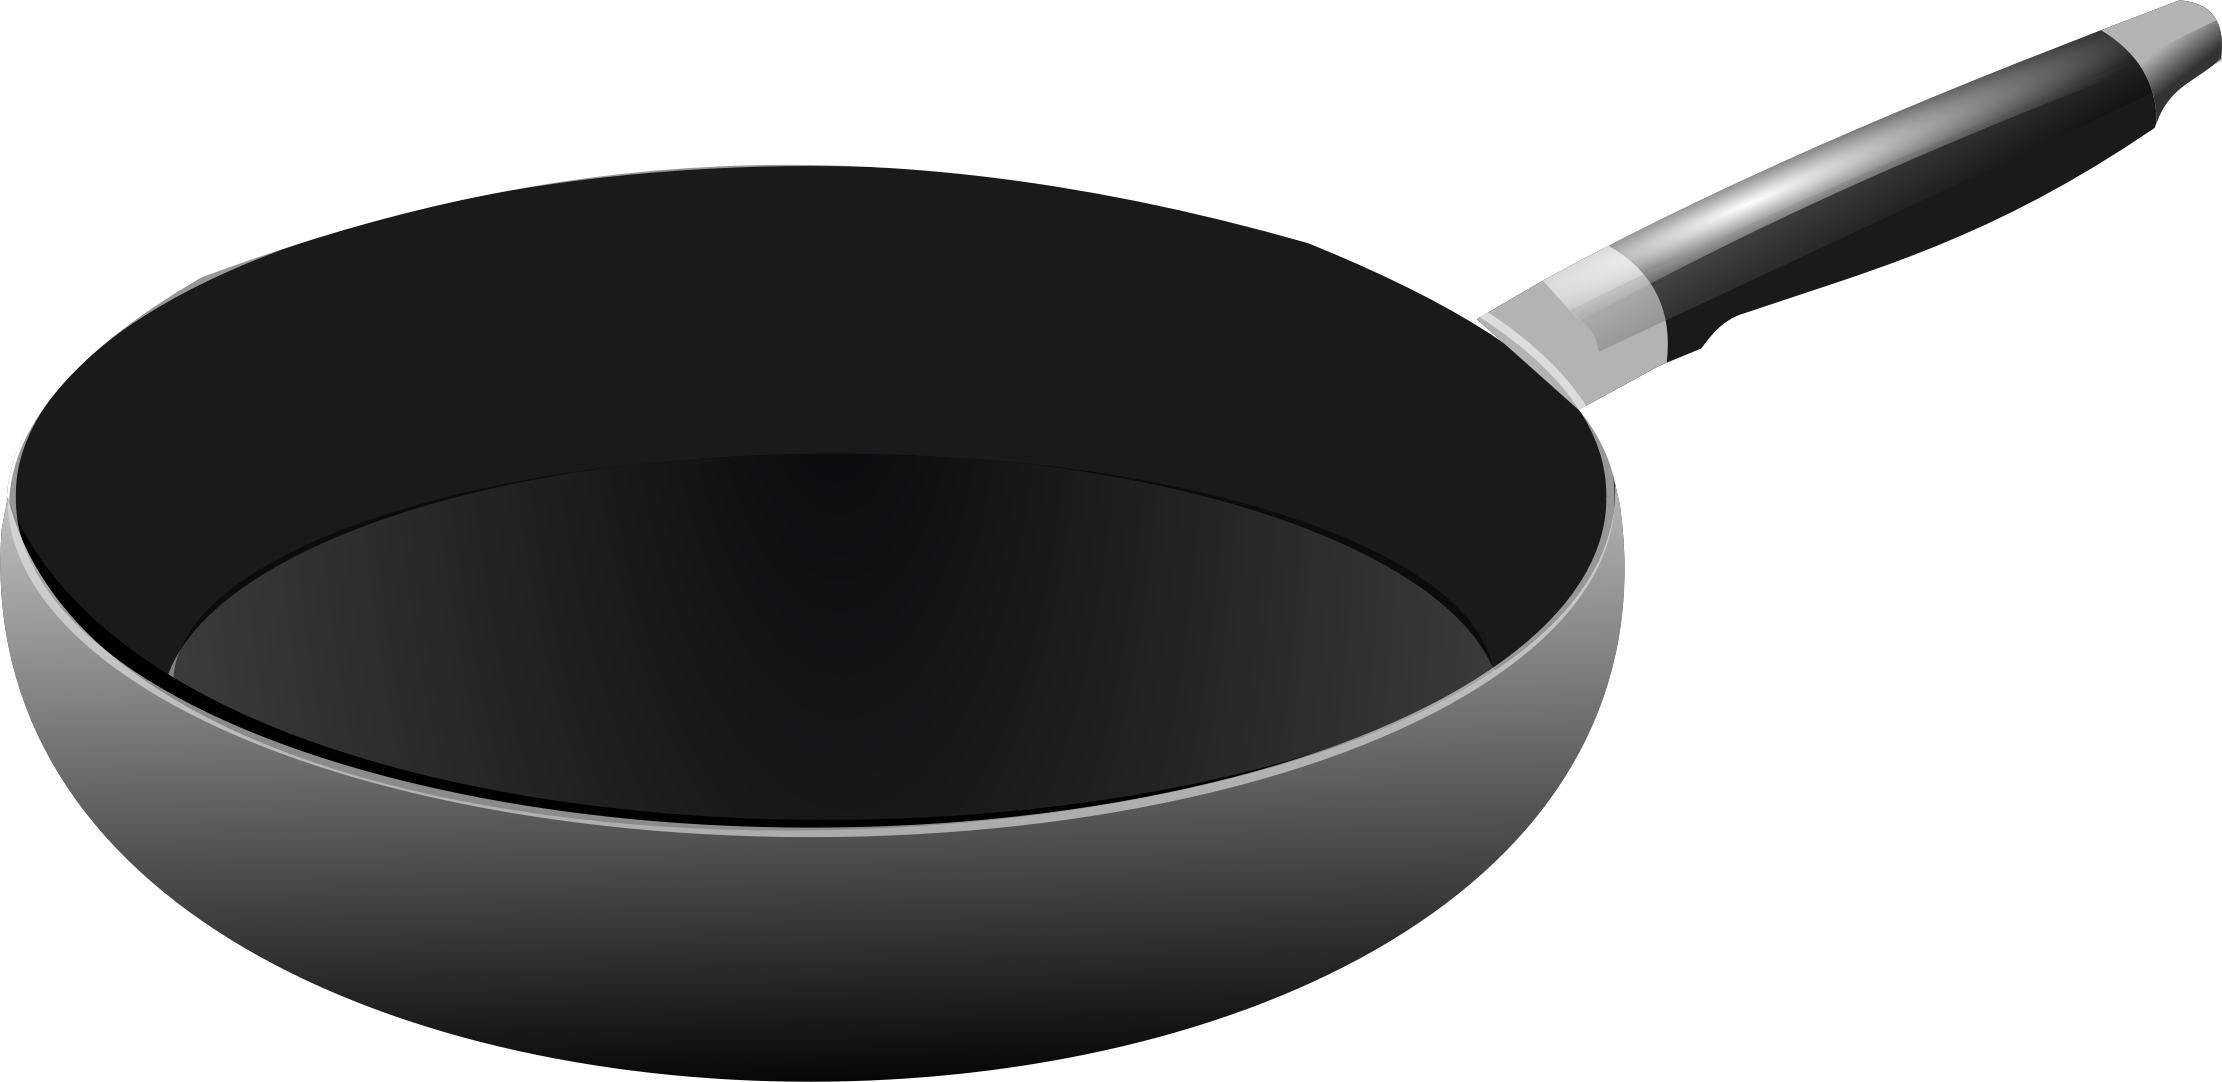 Pan Png Clipart image #43352 - Frying Pan PNG